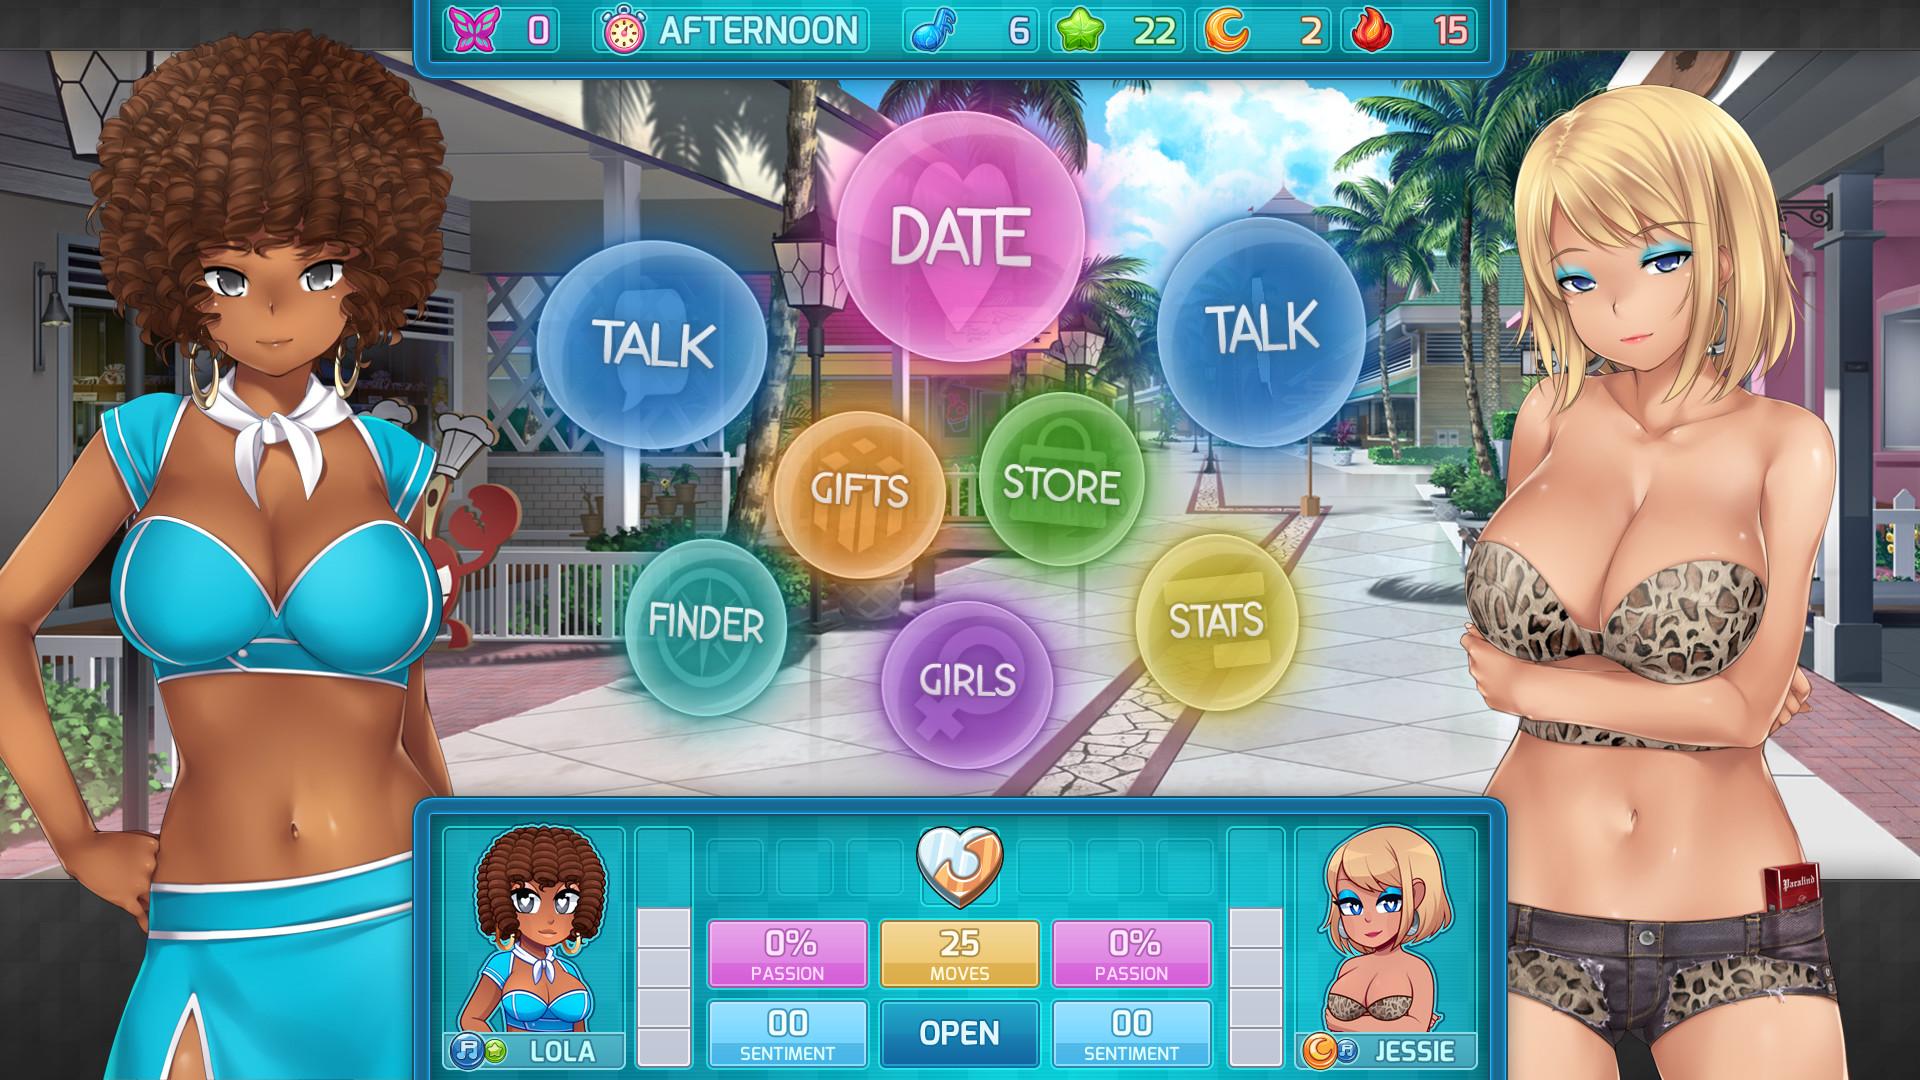 HuniePop 2 Double Date Free Download